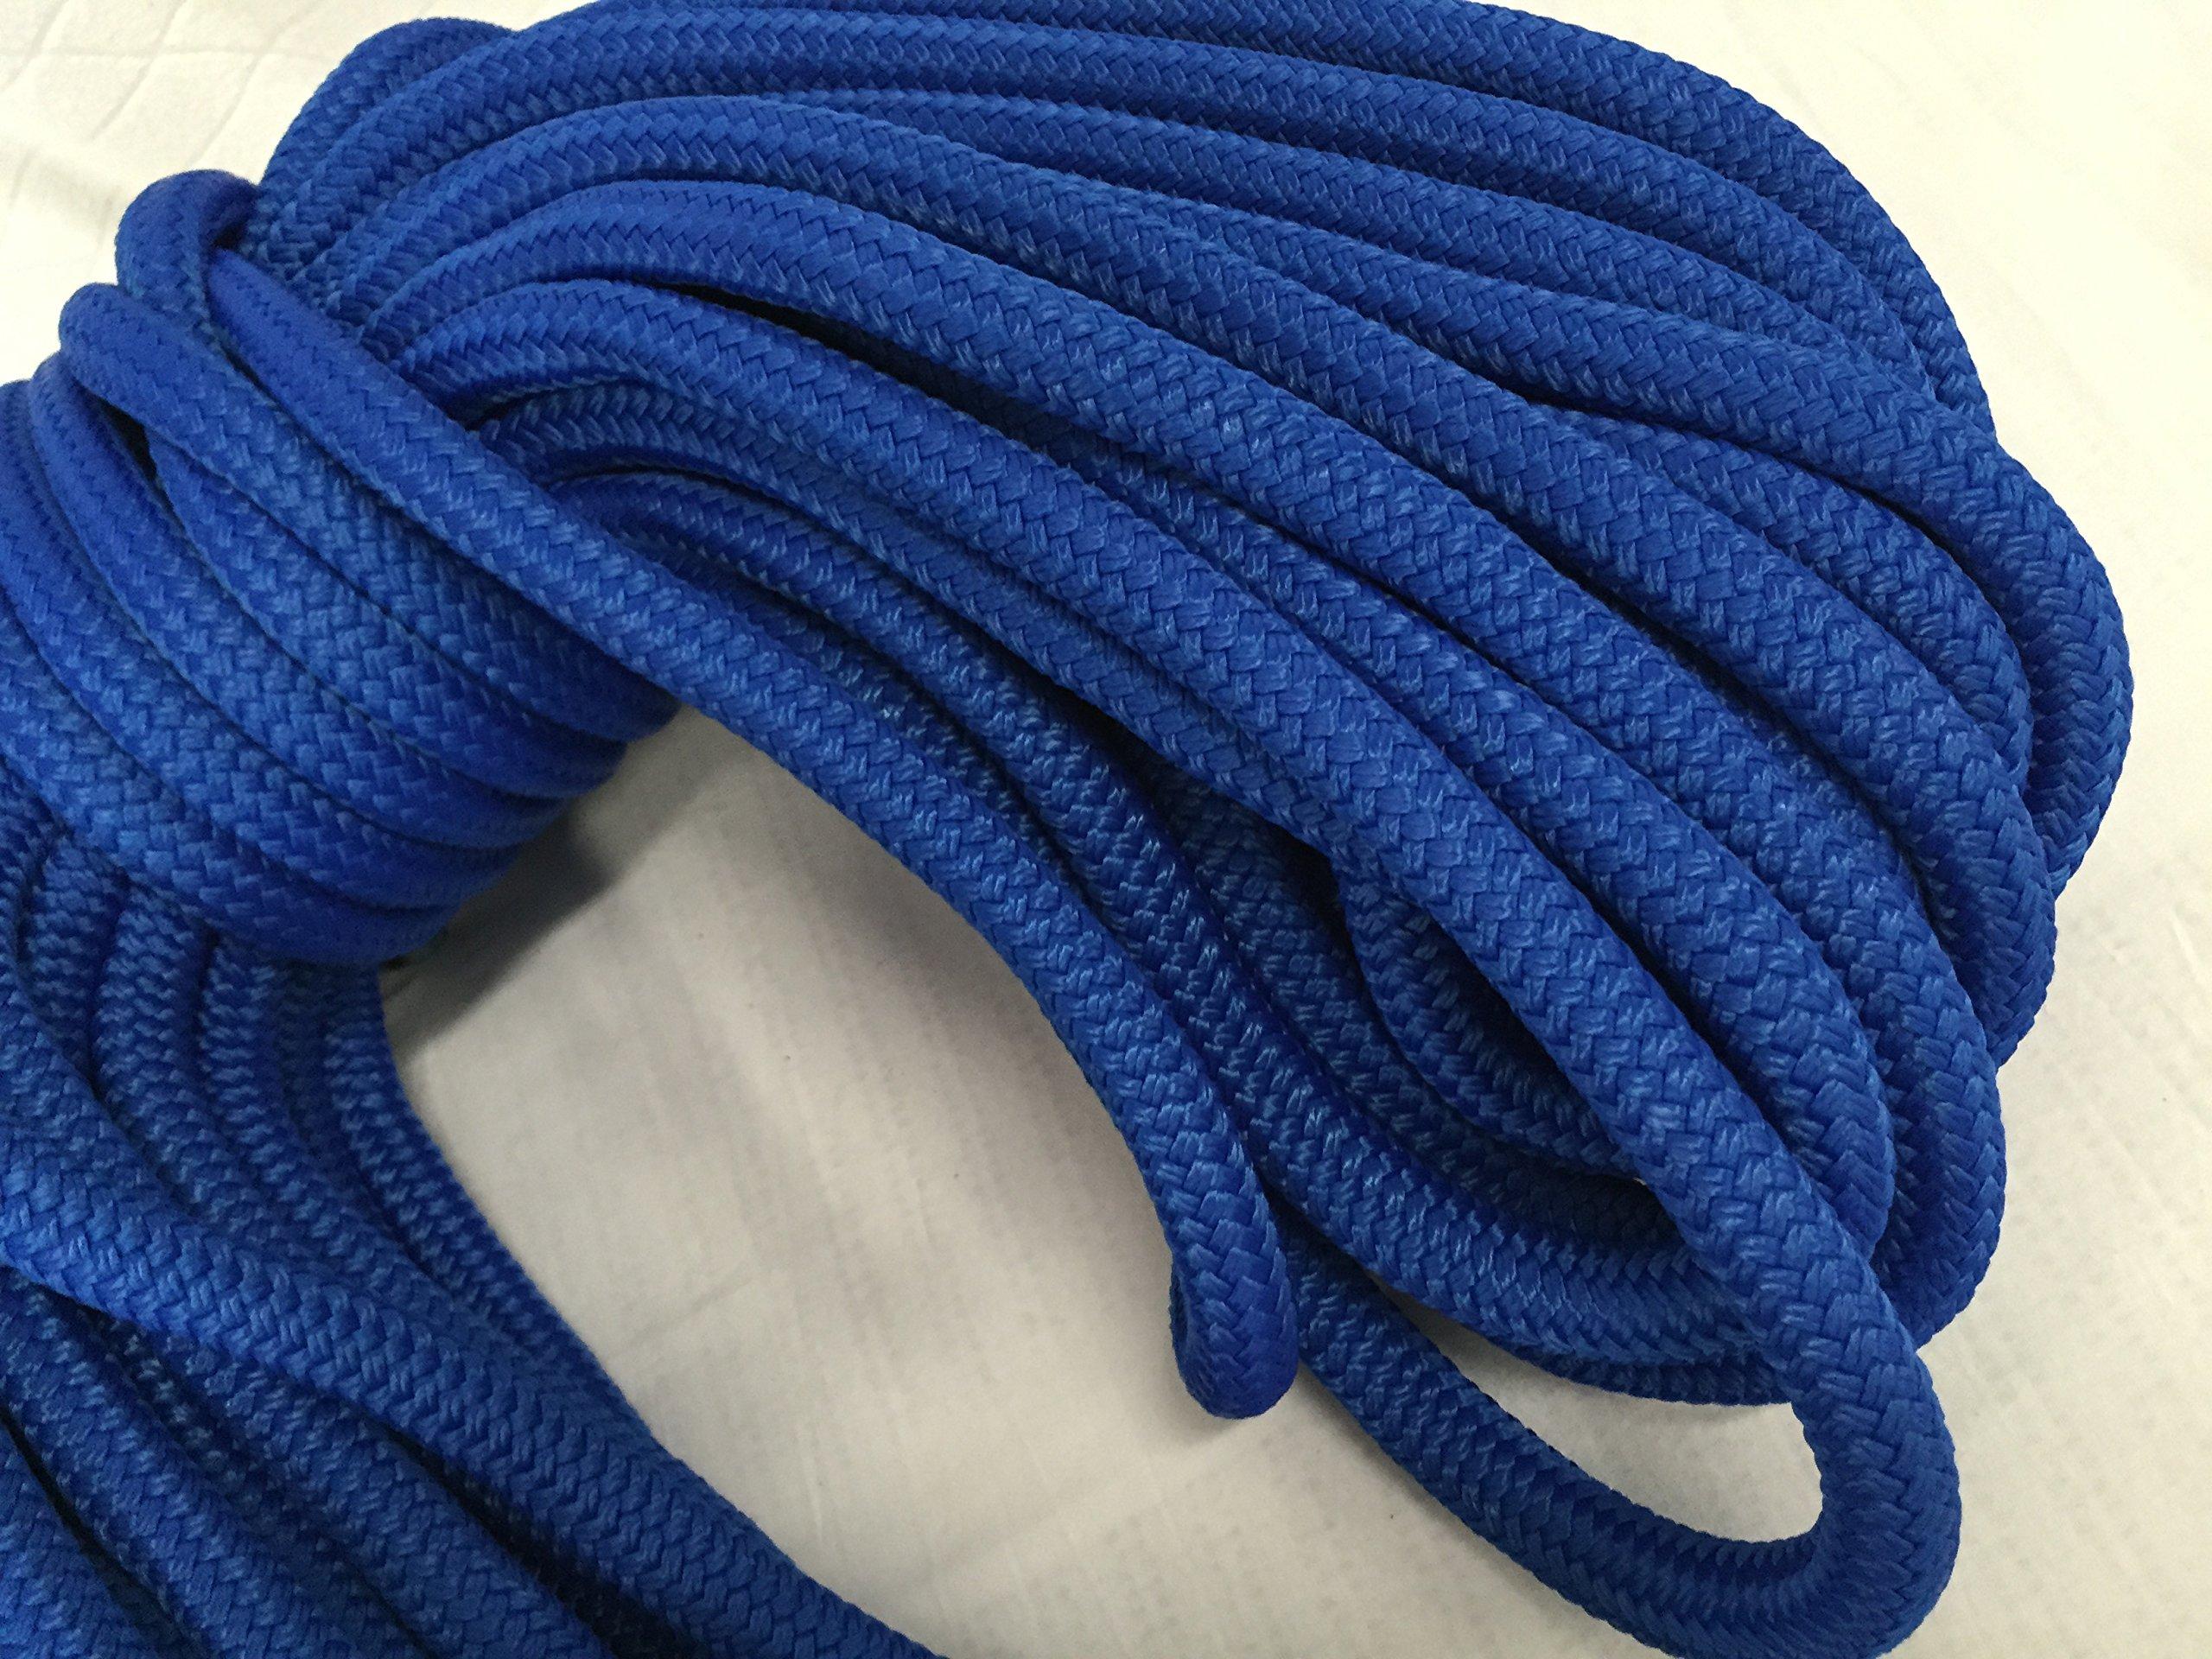 5/8'' x 150' Blue Double Braided Nylon Rope